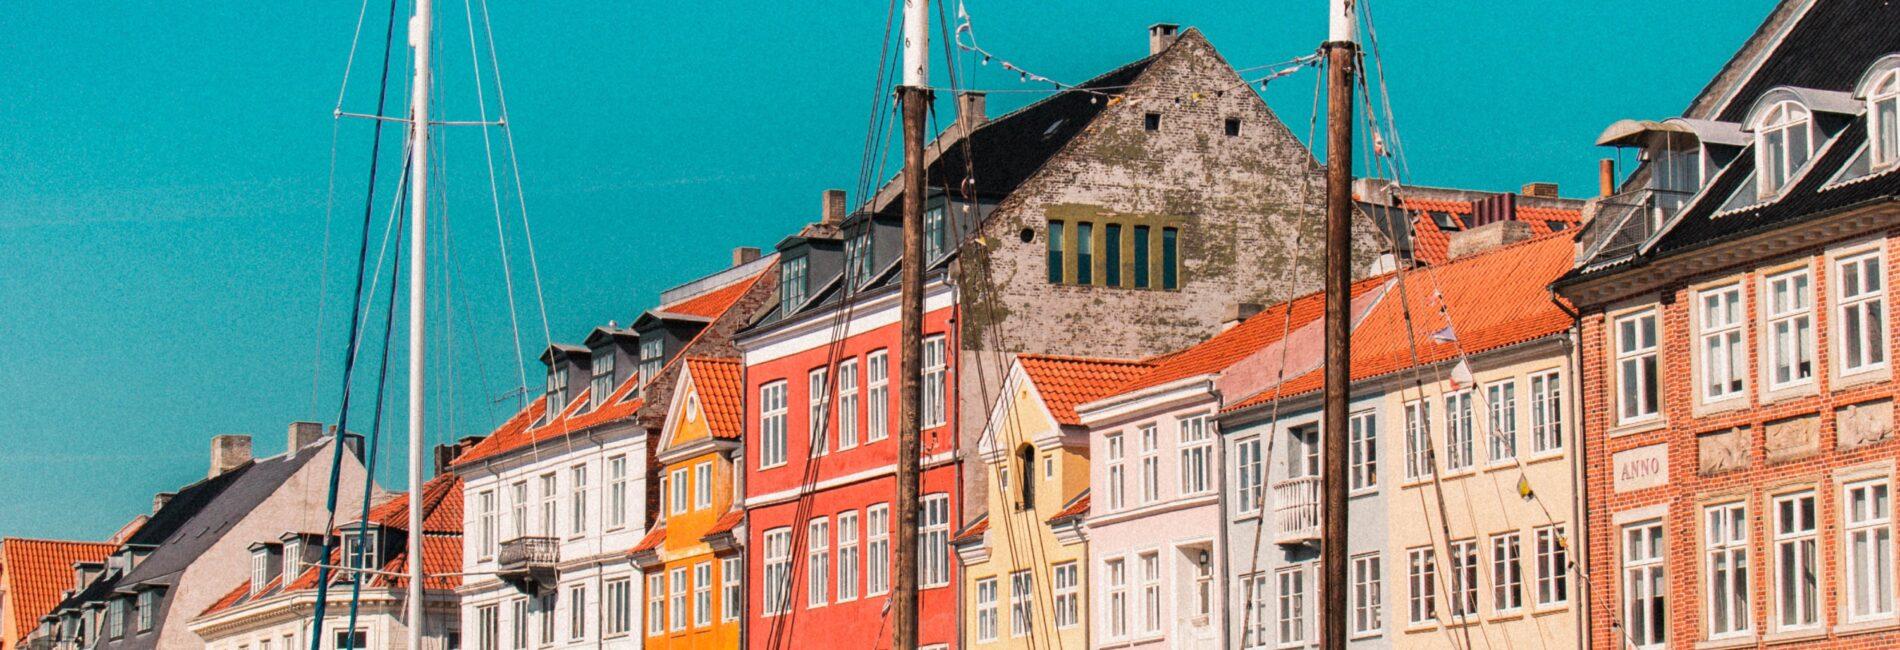 Copenhagen: contemporary art in the most livable city in the world